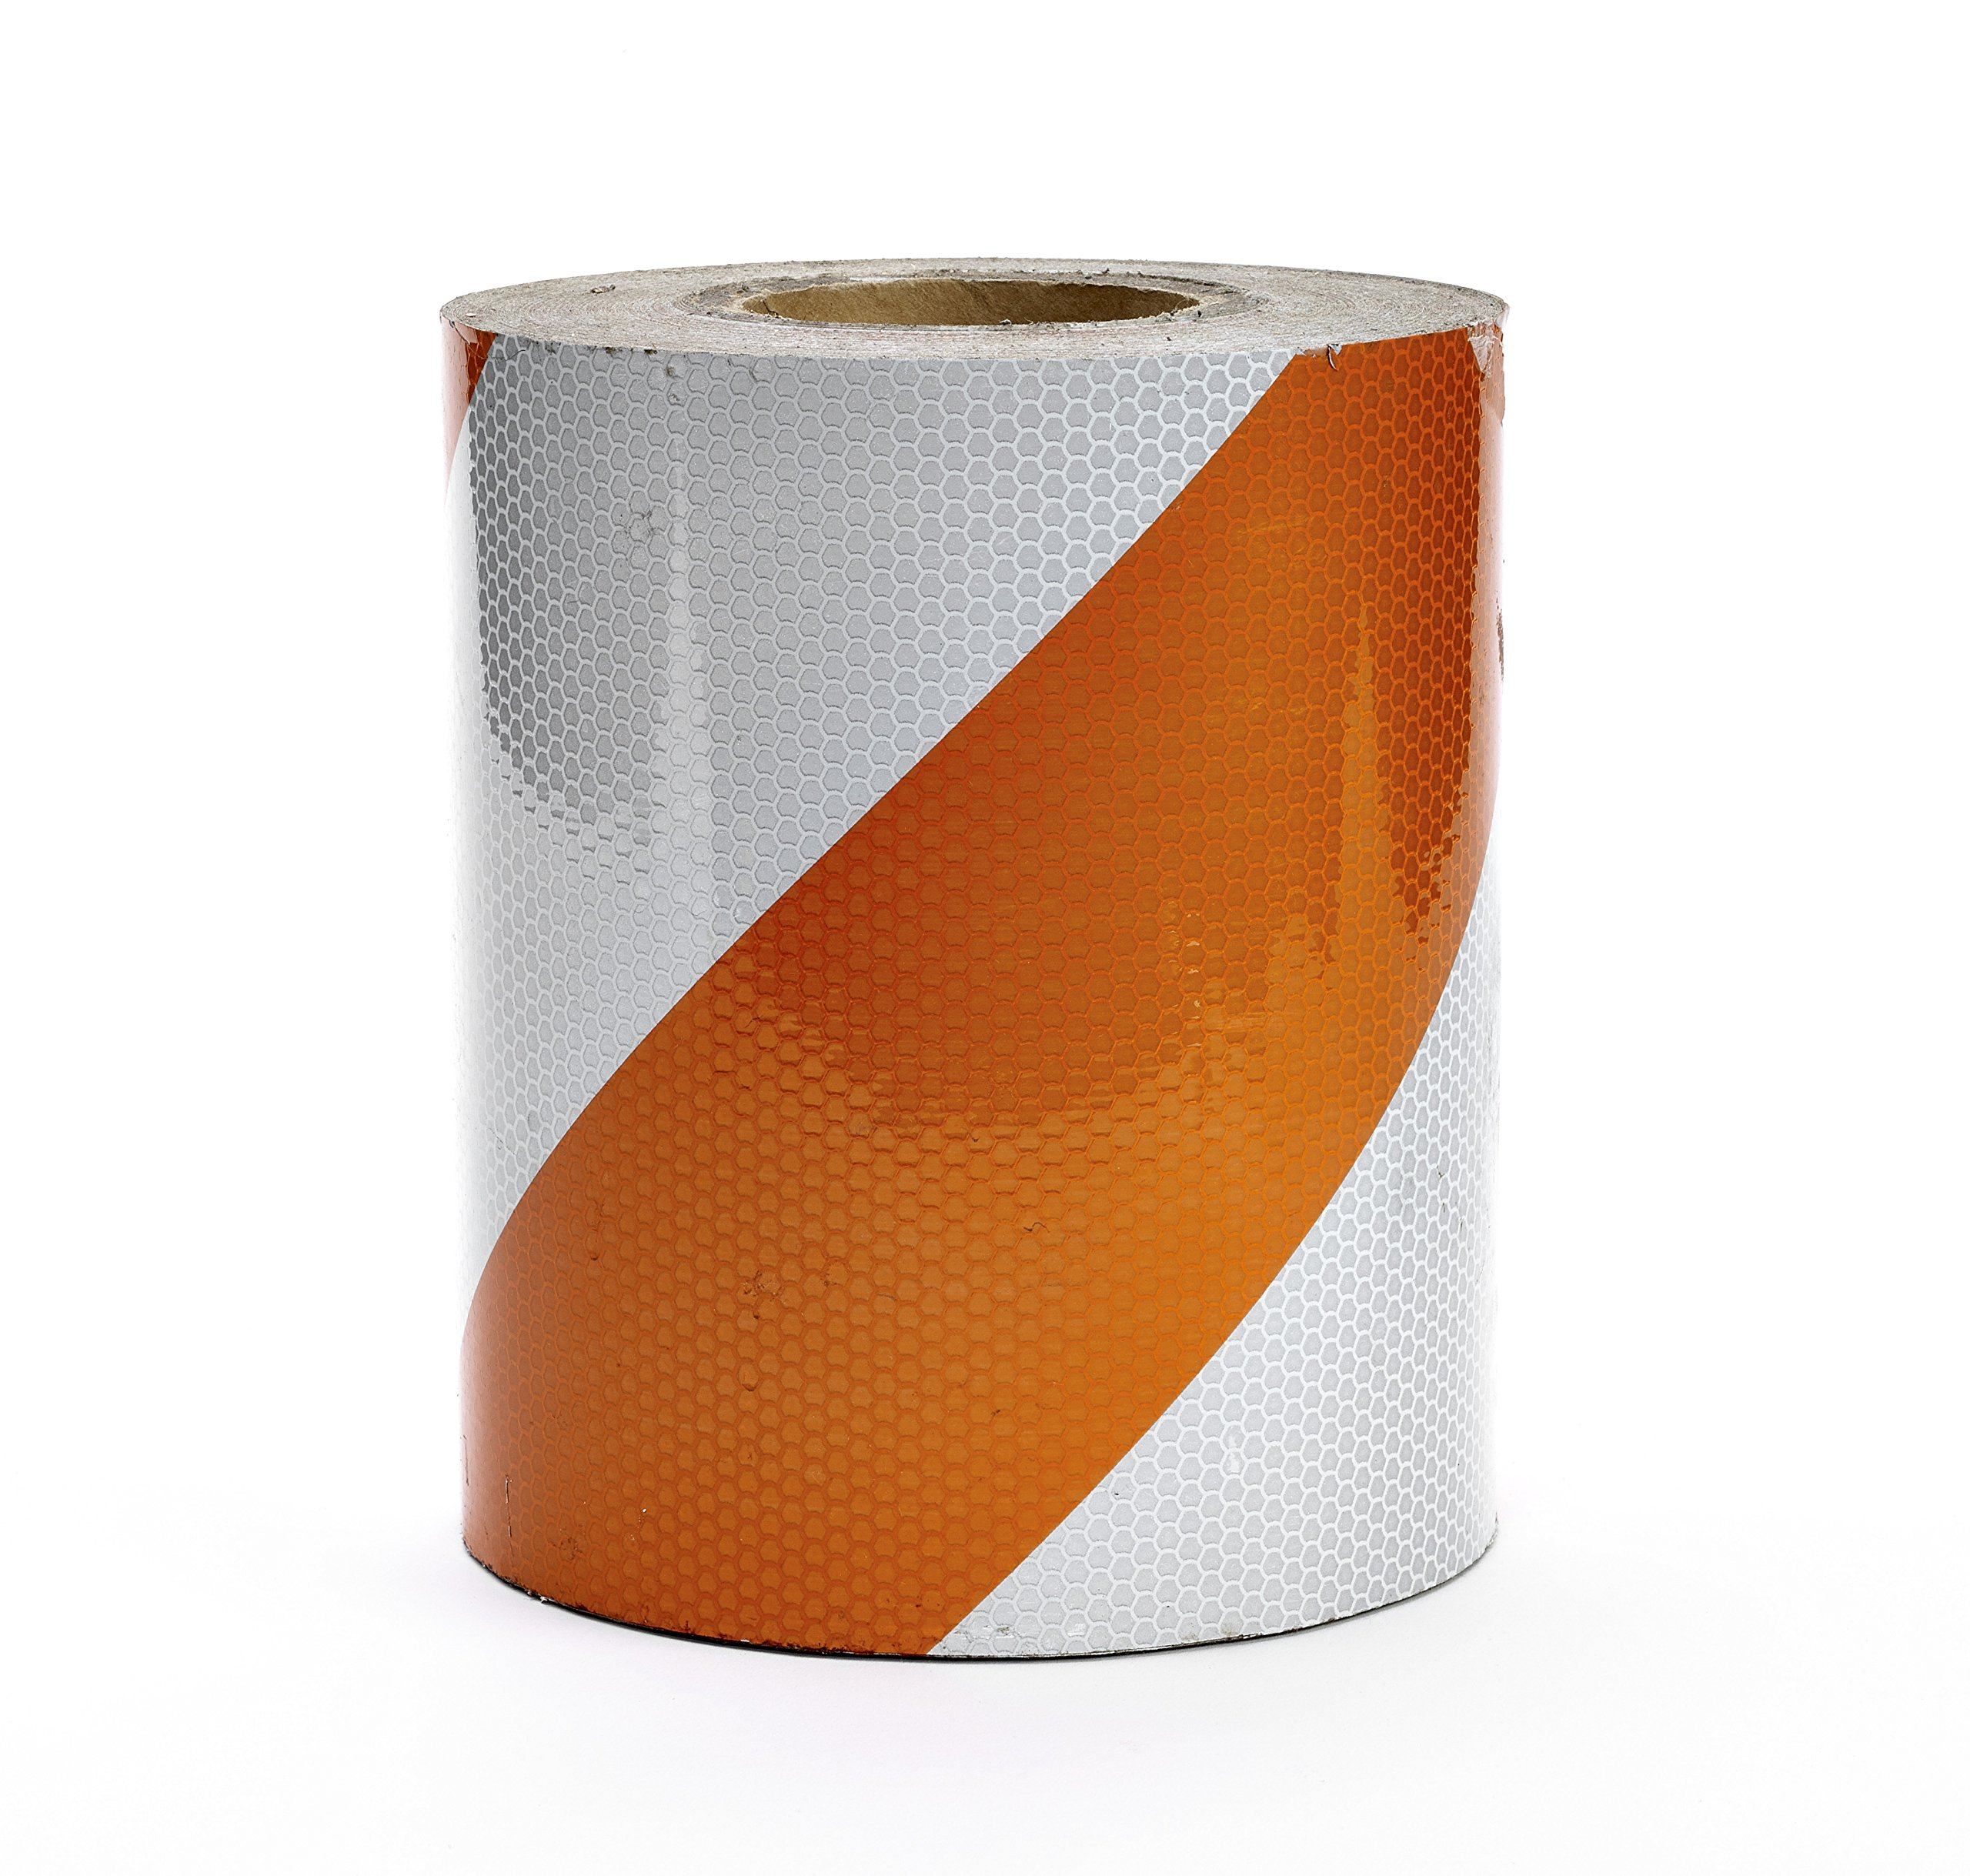 Mutual Industries 17795-1-8000 Engineering Grade ASTM Type I Reflective Barricade Tape, 8'' x 50 yd, Orange/White Stripe